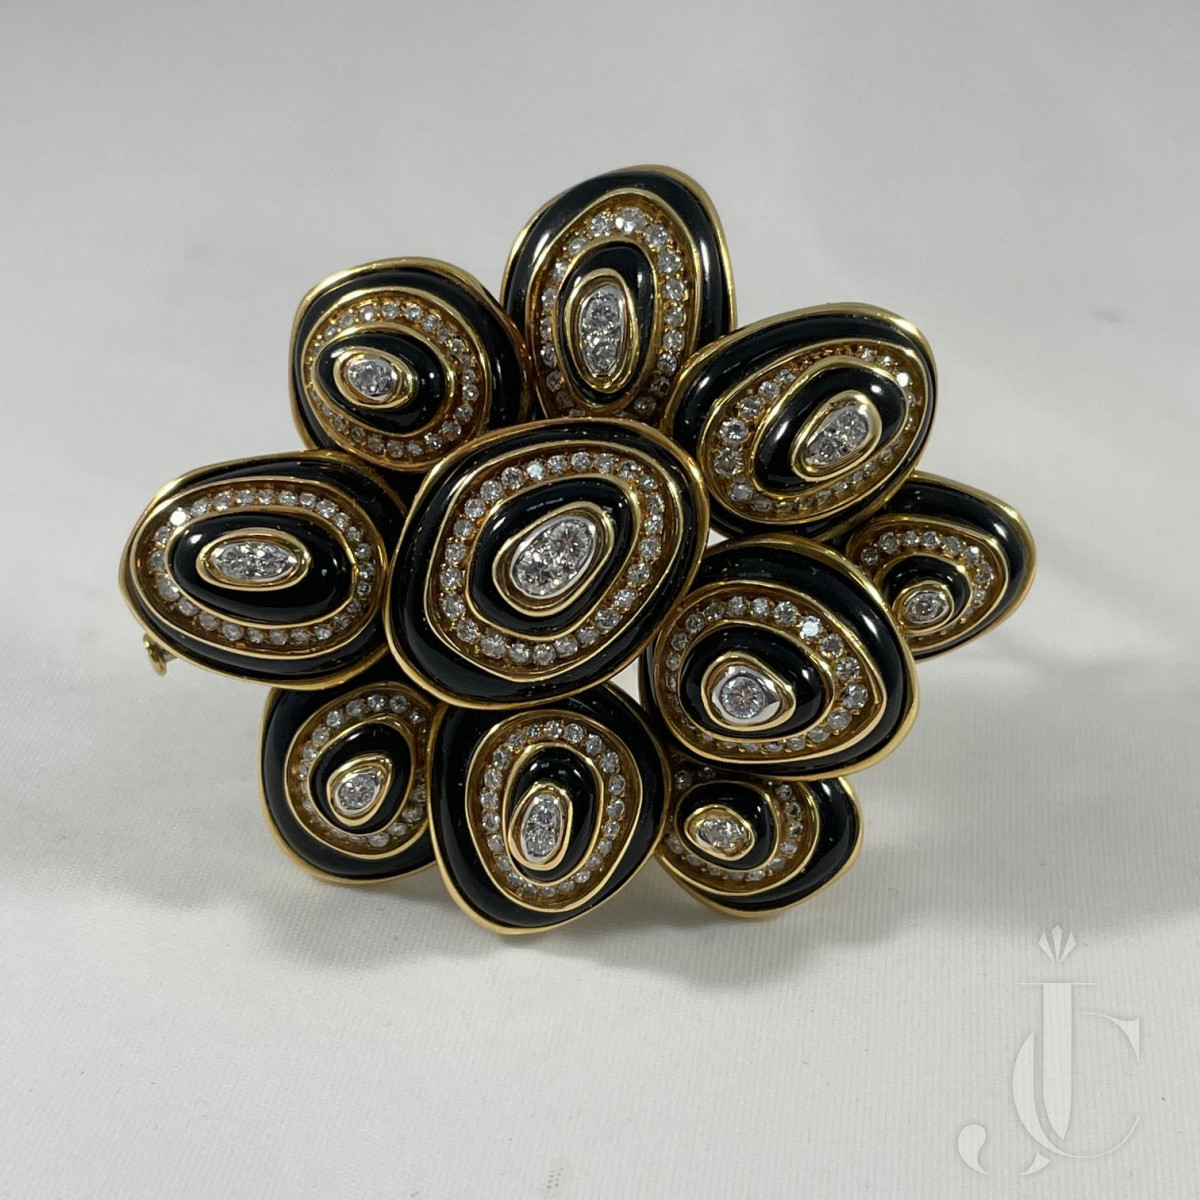 Bulgari 18kt black enamel and diamond brooch